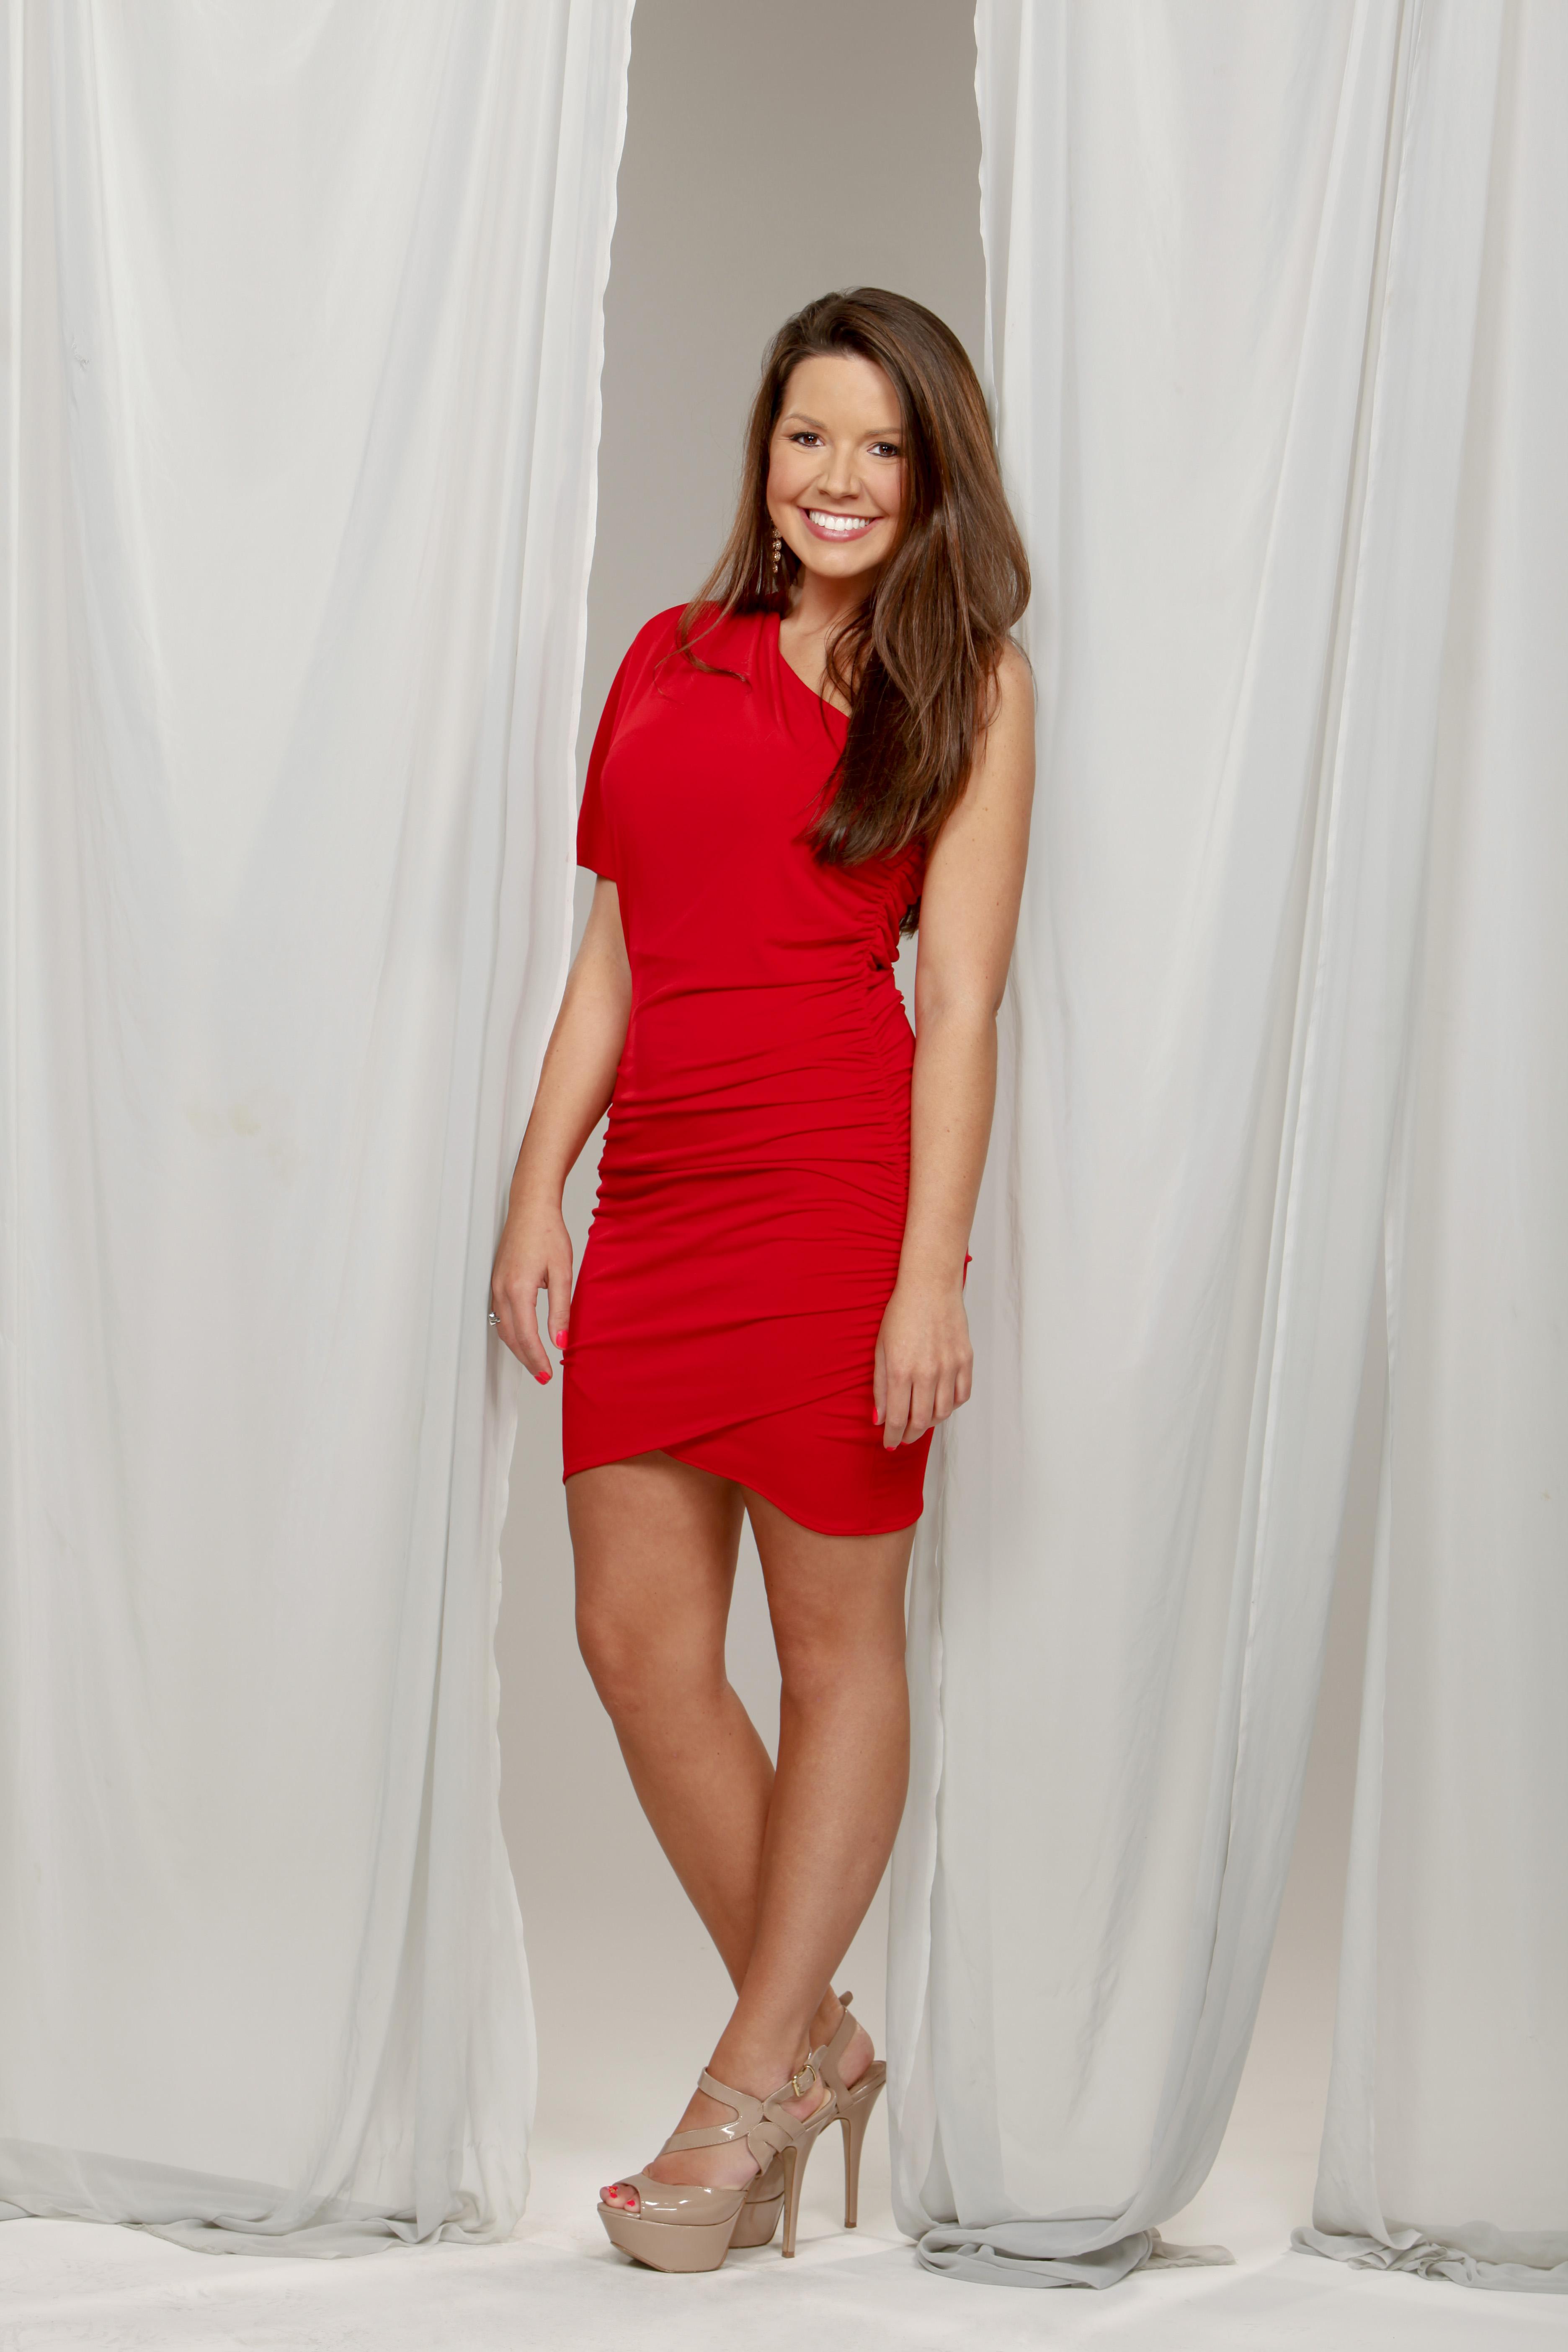 Danielle Murphree